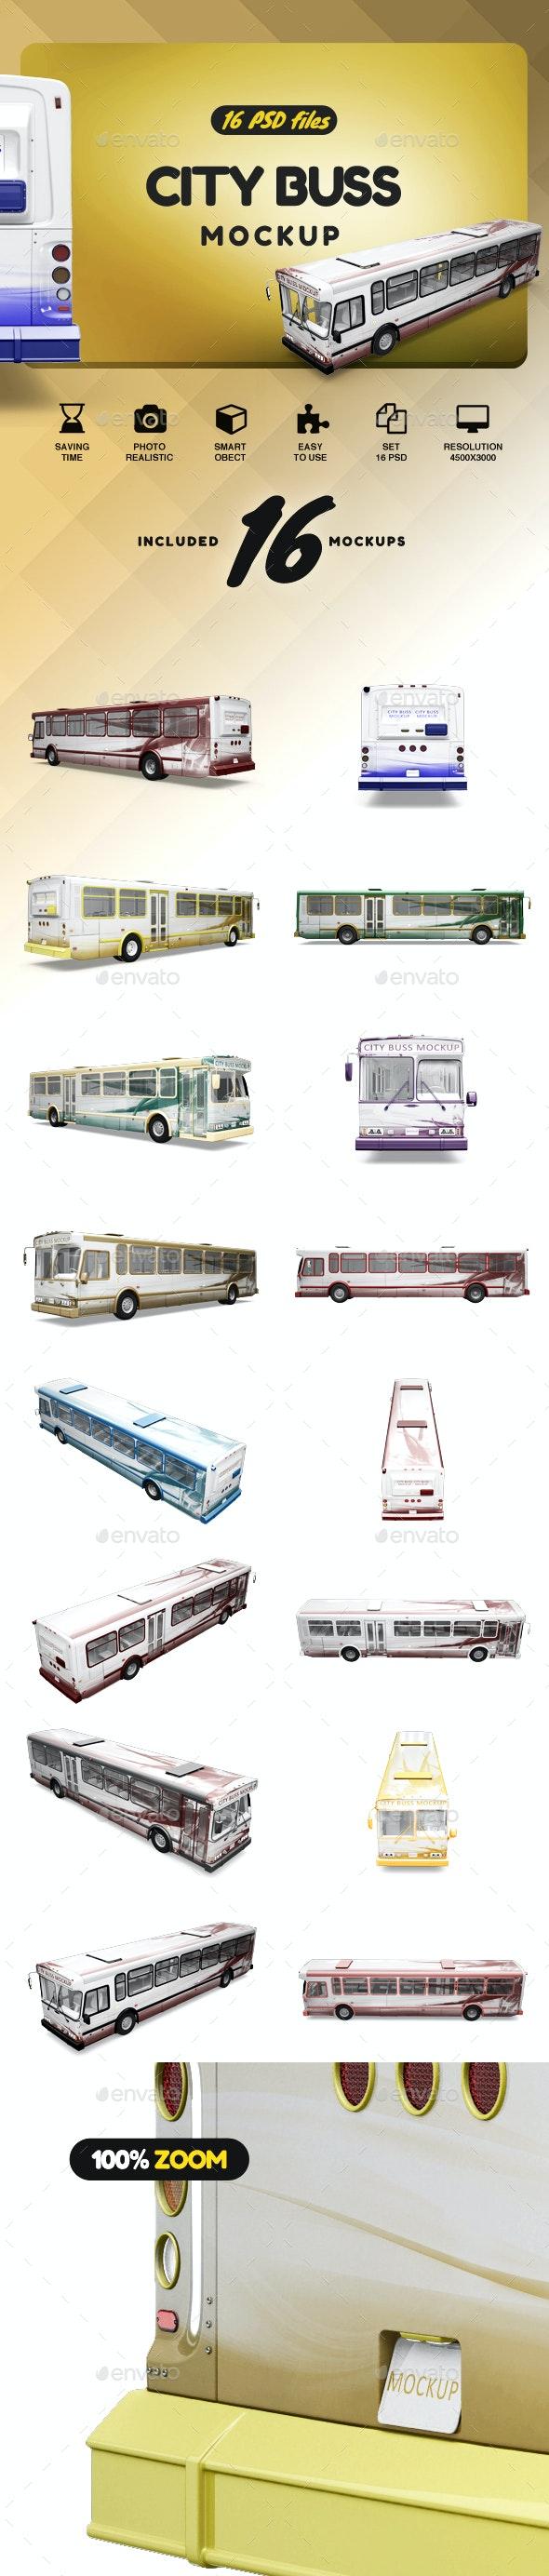 City Bus MockUp - Product Mock-Ups Graphics